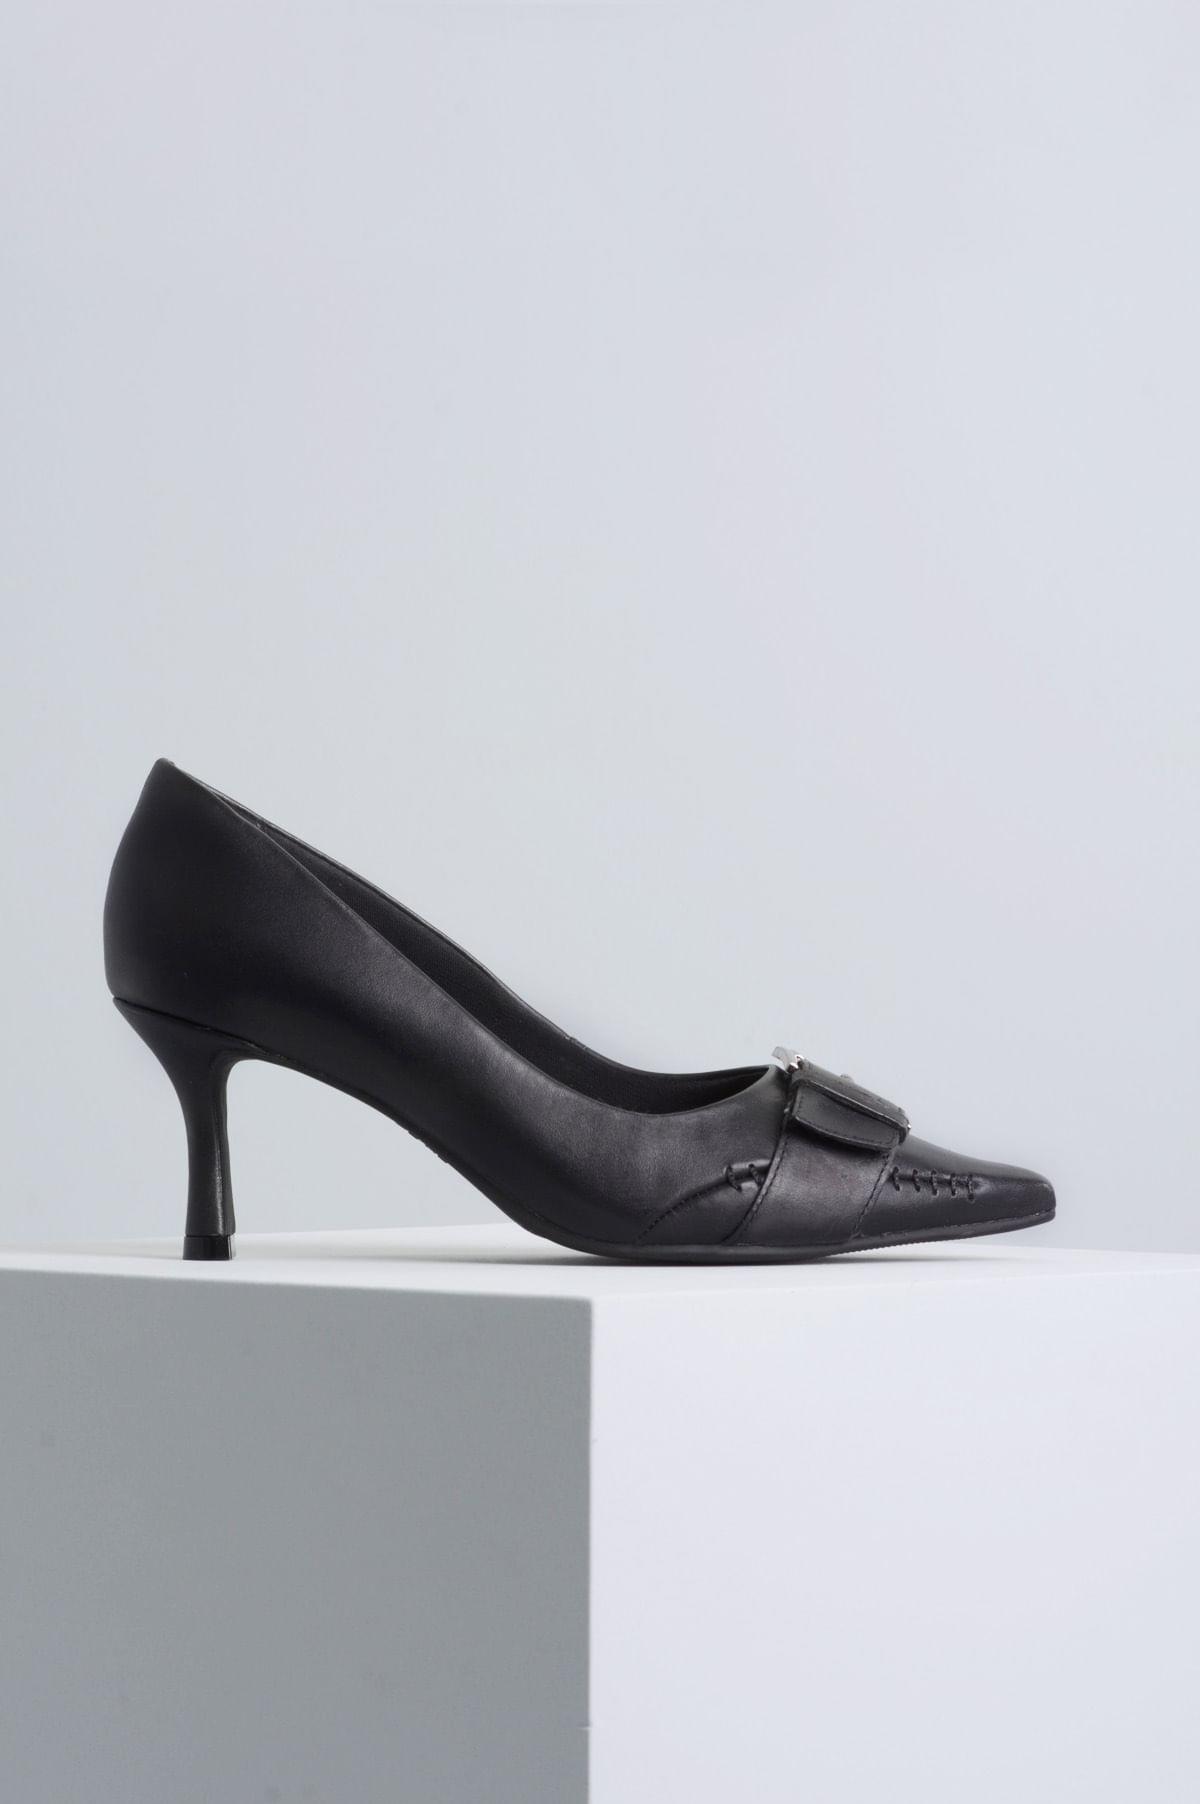 172661f14d Scarpin Salto Alto Marlise Ramarim CR-PRETO - Mundial Calçados